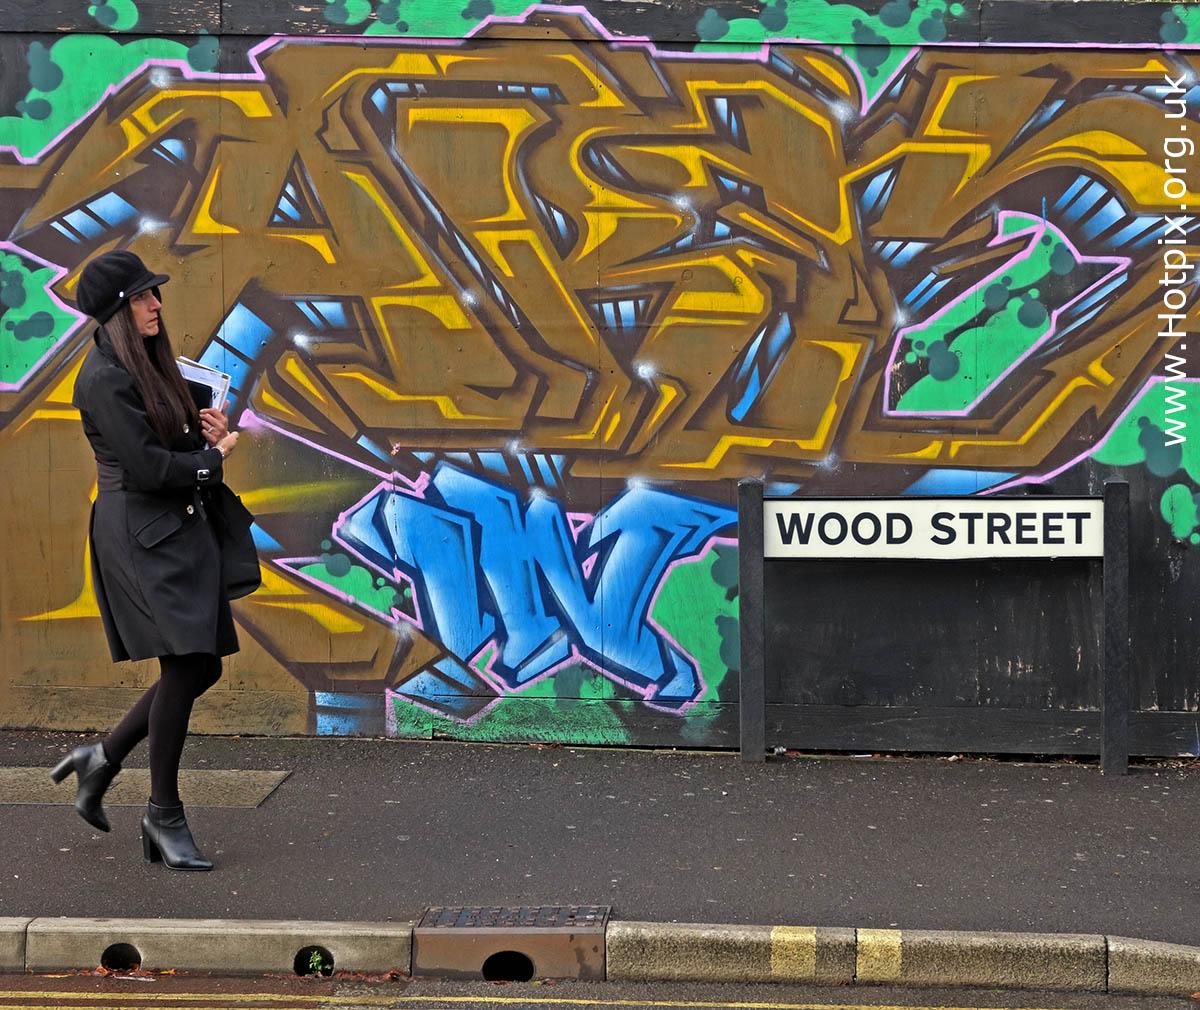 HousingITguy,Project365,2nd 365,HotpixUK365,Tone Smith,GoTonySmith,365,2365,one a day,Tony Smith,Hotpix,Wood street,Wood St,Taunton,Somerset,art,Graffiti